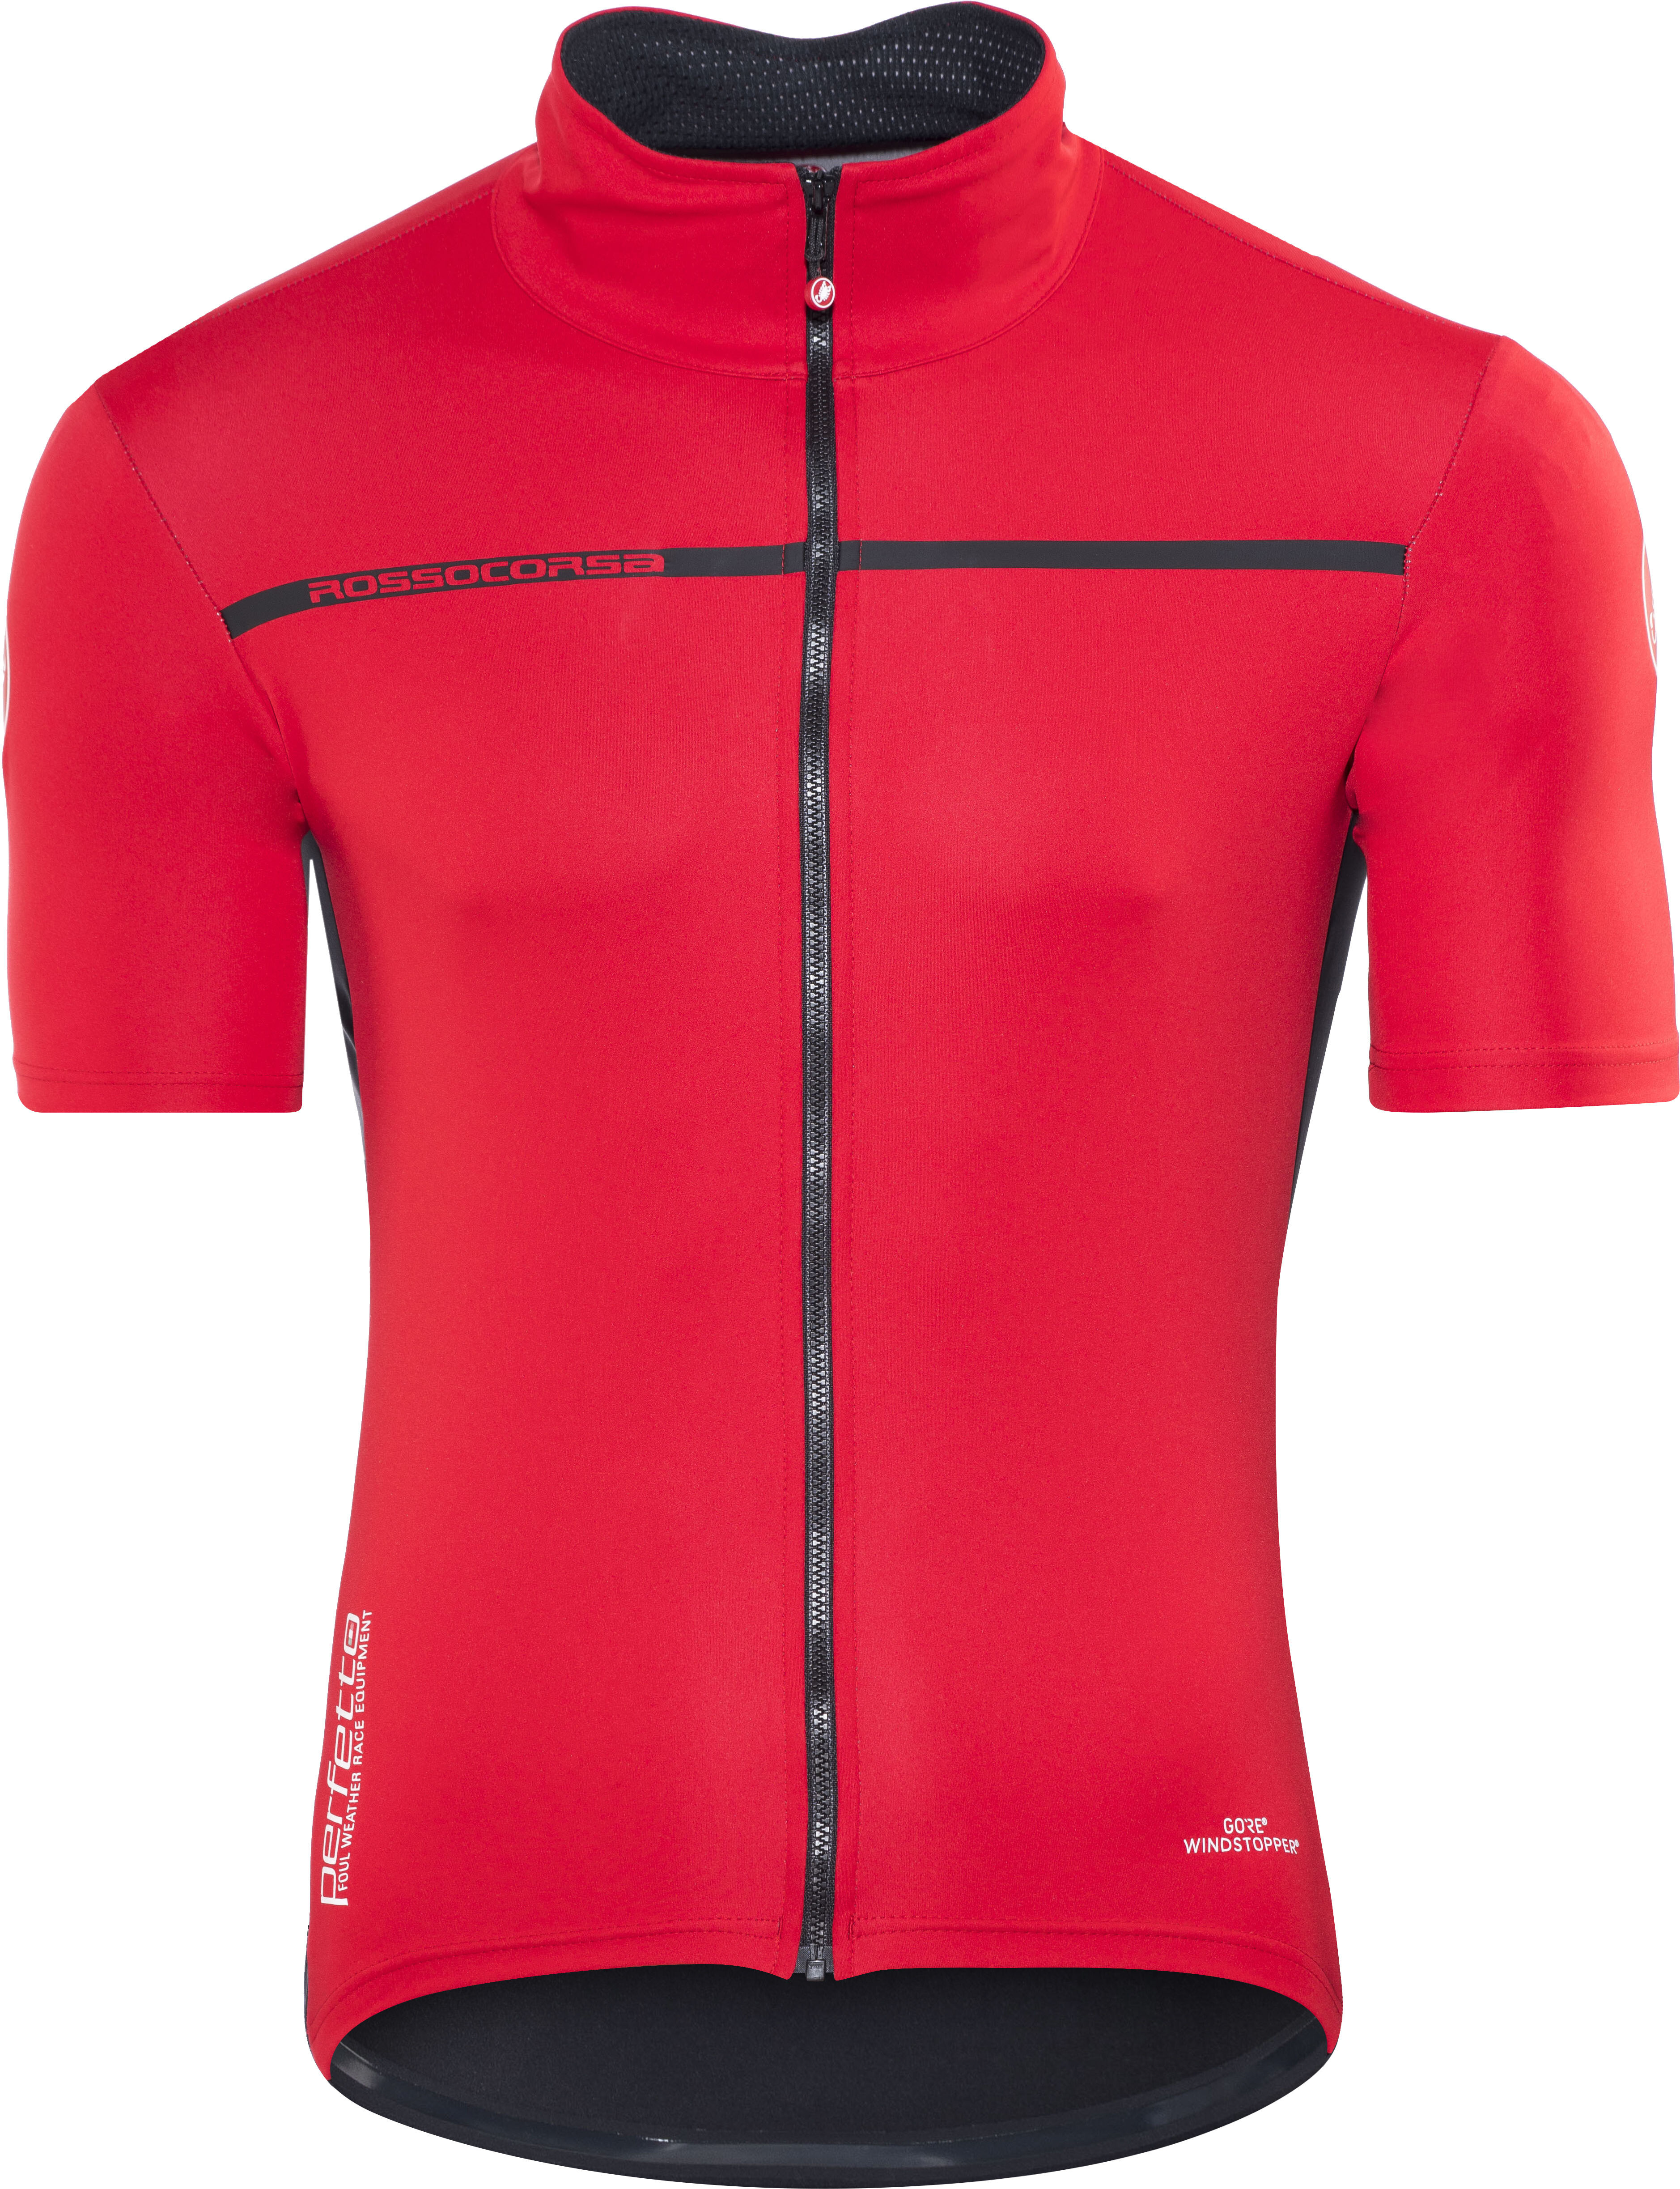 Castelli Perfetto Light 2 Bike Jersey Shortsleeve Men red at ... 943530f15